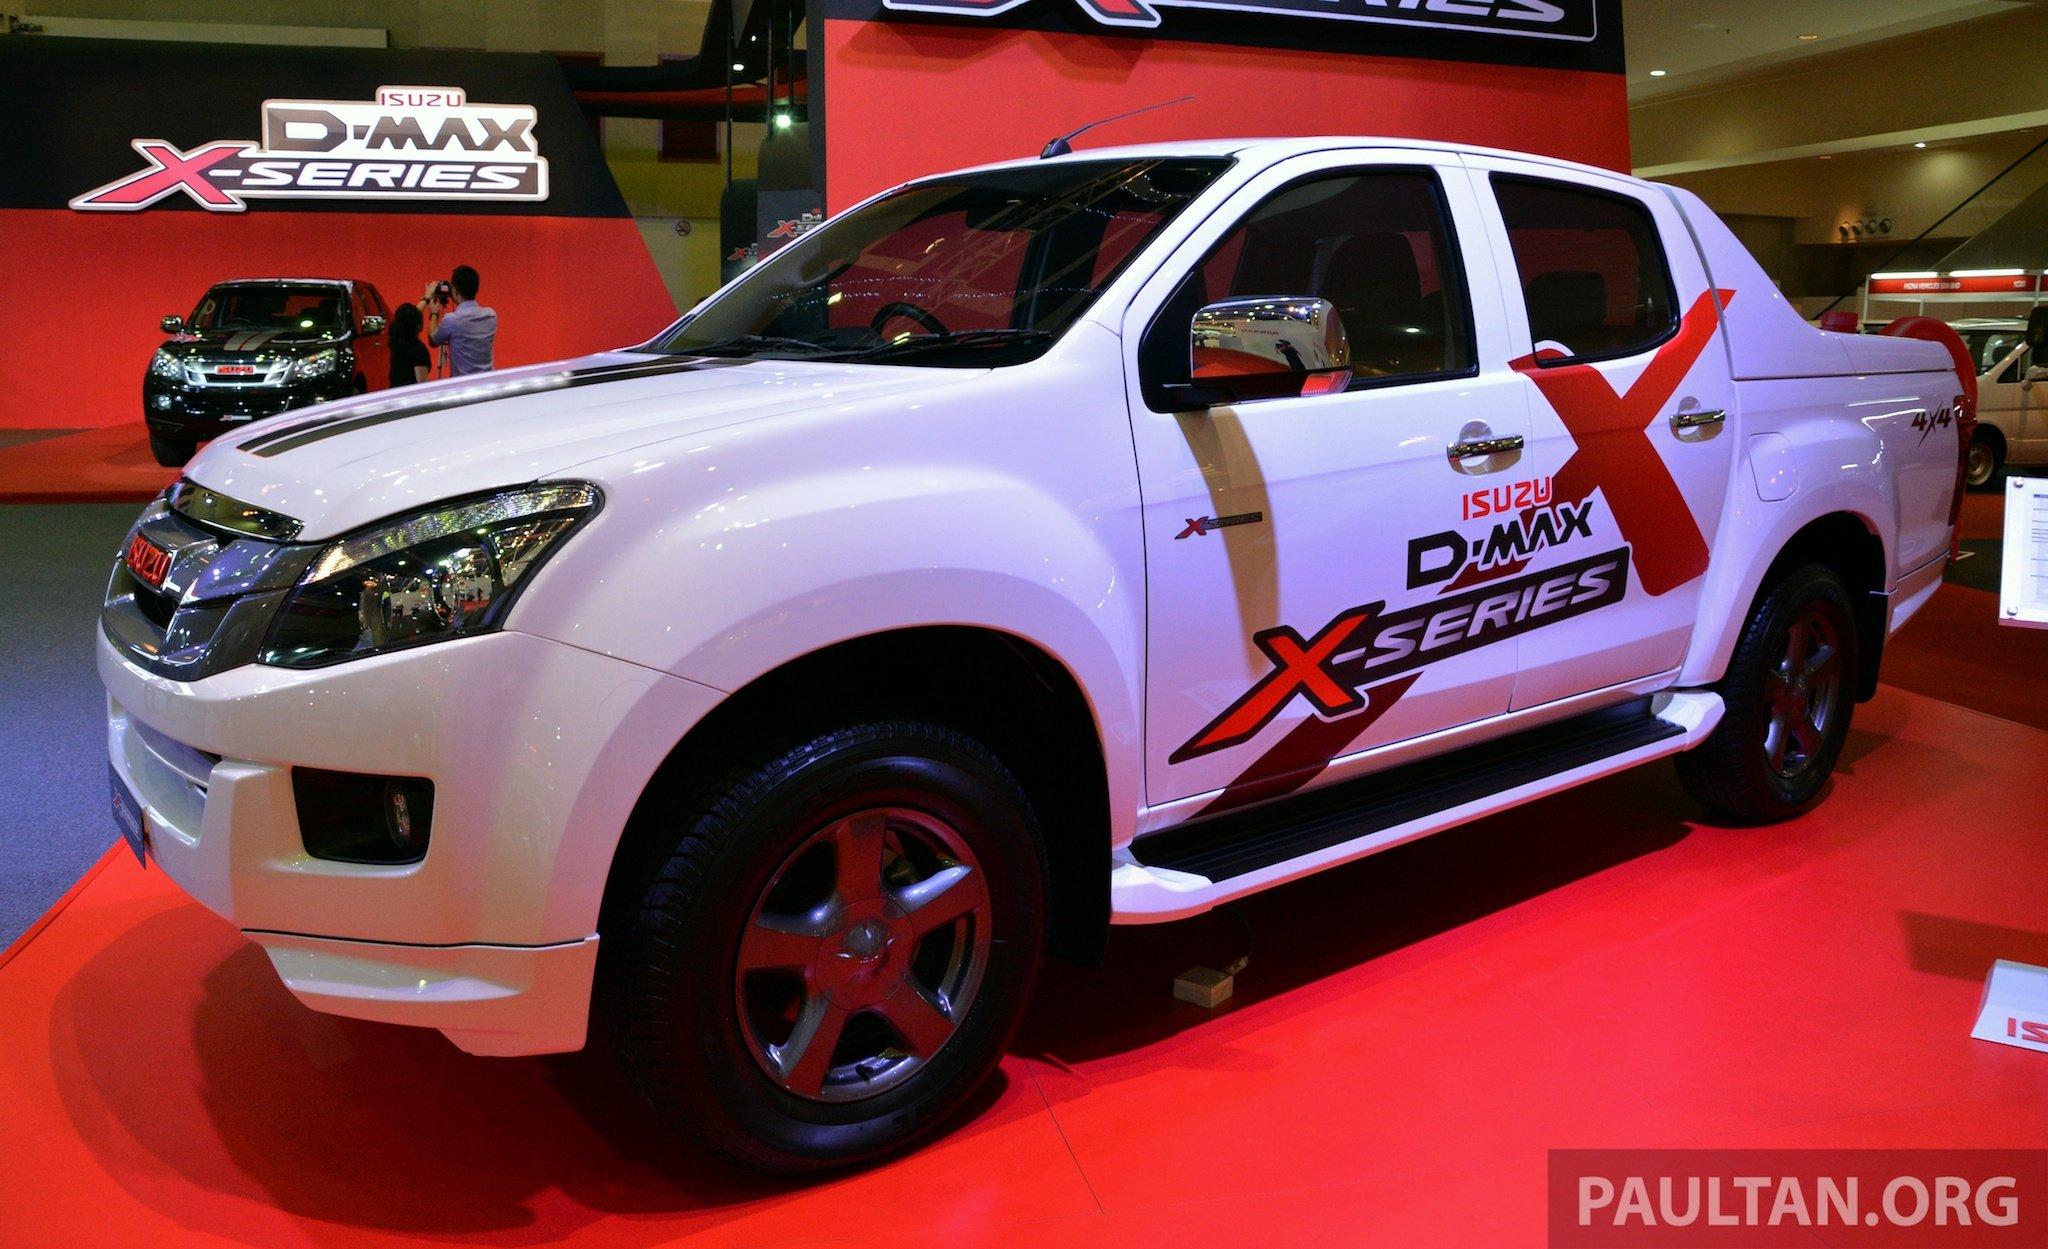 Fair Market Value Car Calculator >> 2013 Isuzu D-Max X-Series launched - only 300 units